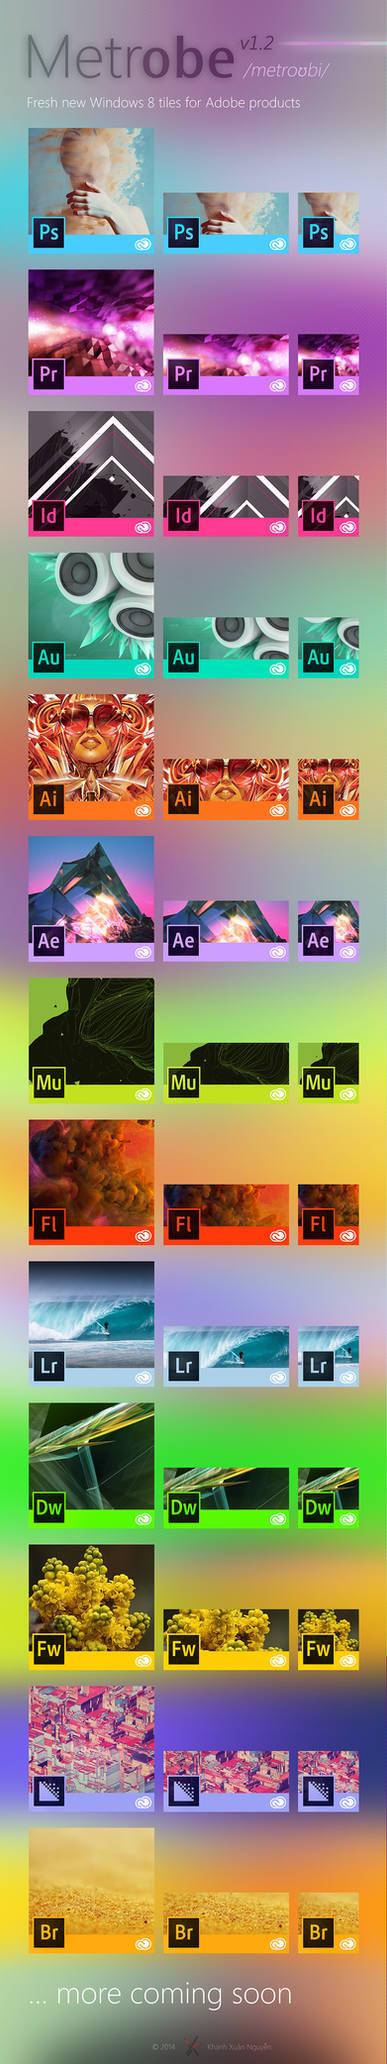 METROBE: Windows 8 Tiles for Adobe CC 2014 product